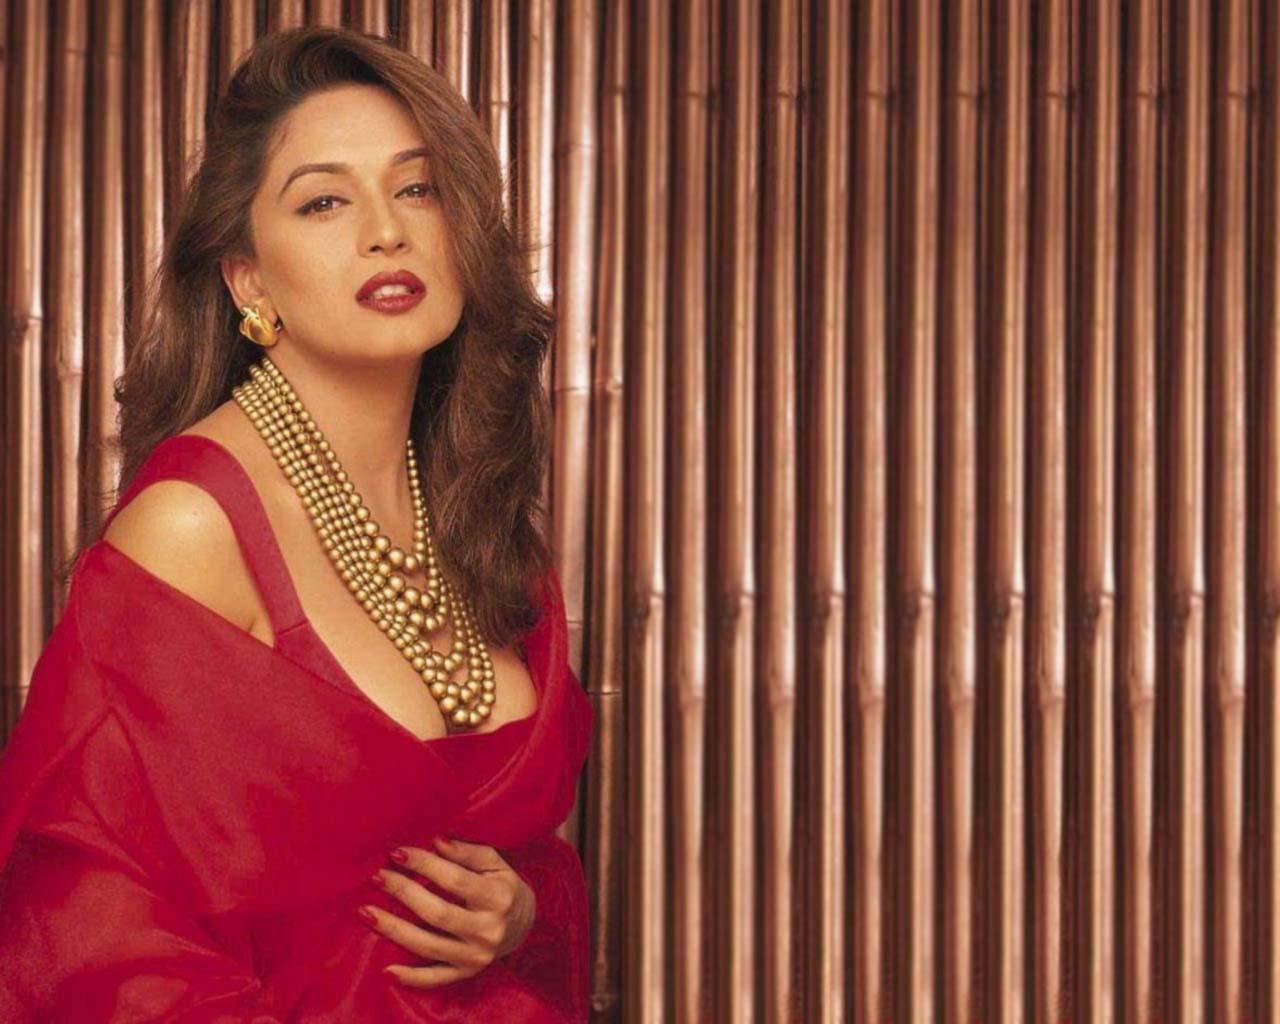 Madhuri Dixit Sexy Image